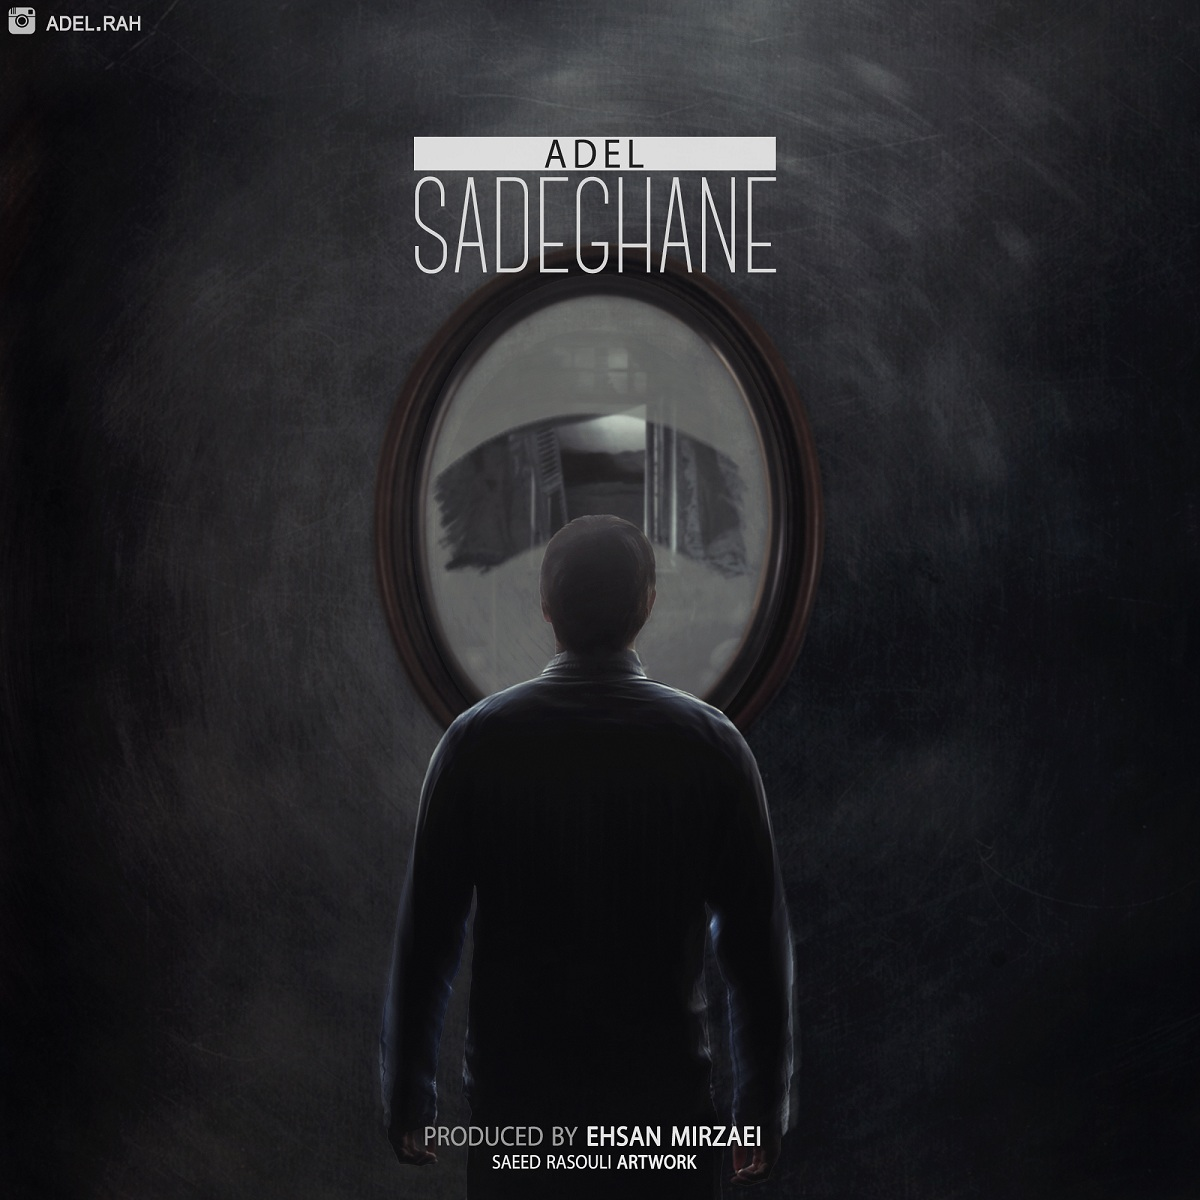 Adel – Sadeghaneh | Produced Ehsan Mirzaei